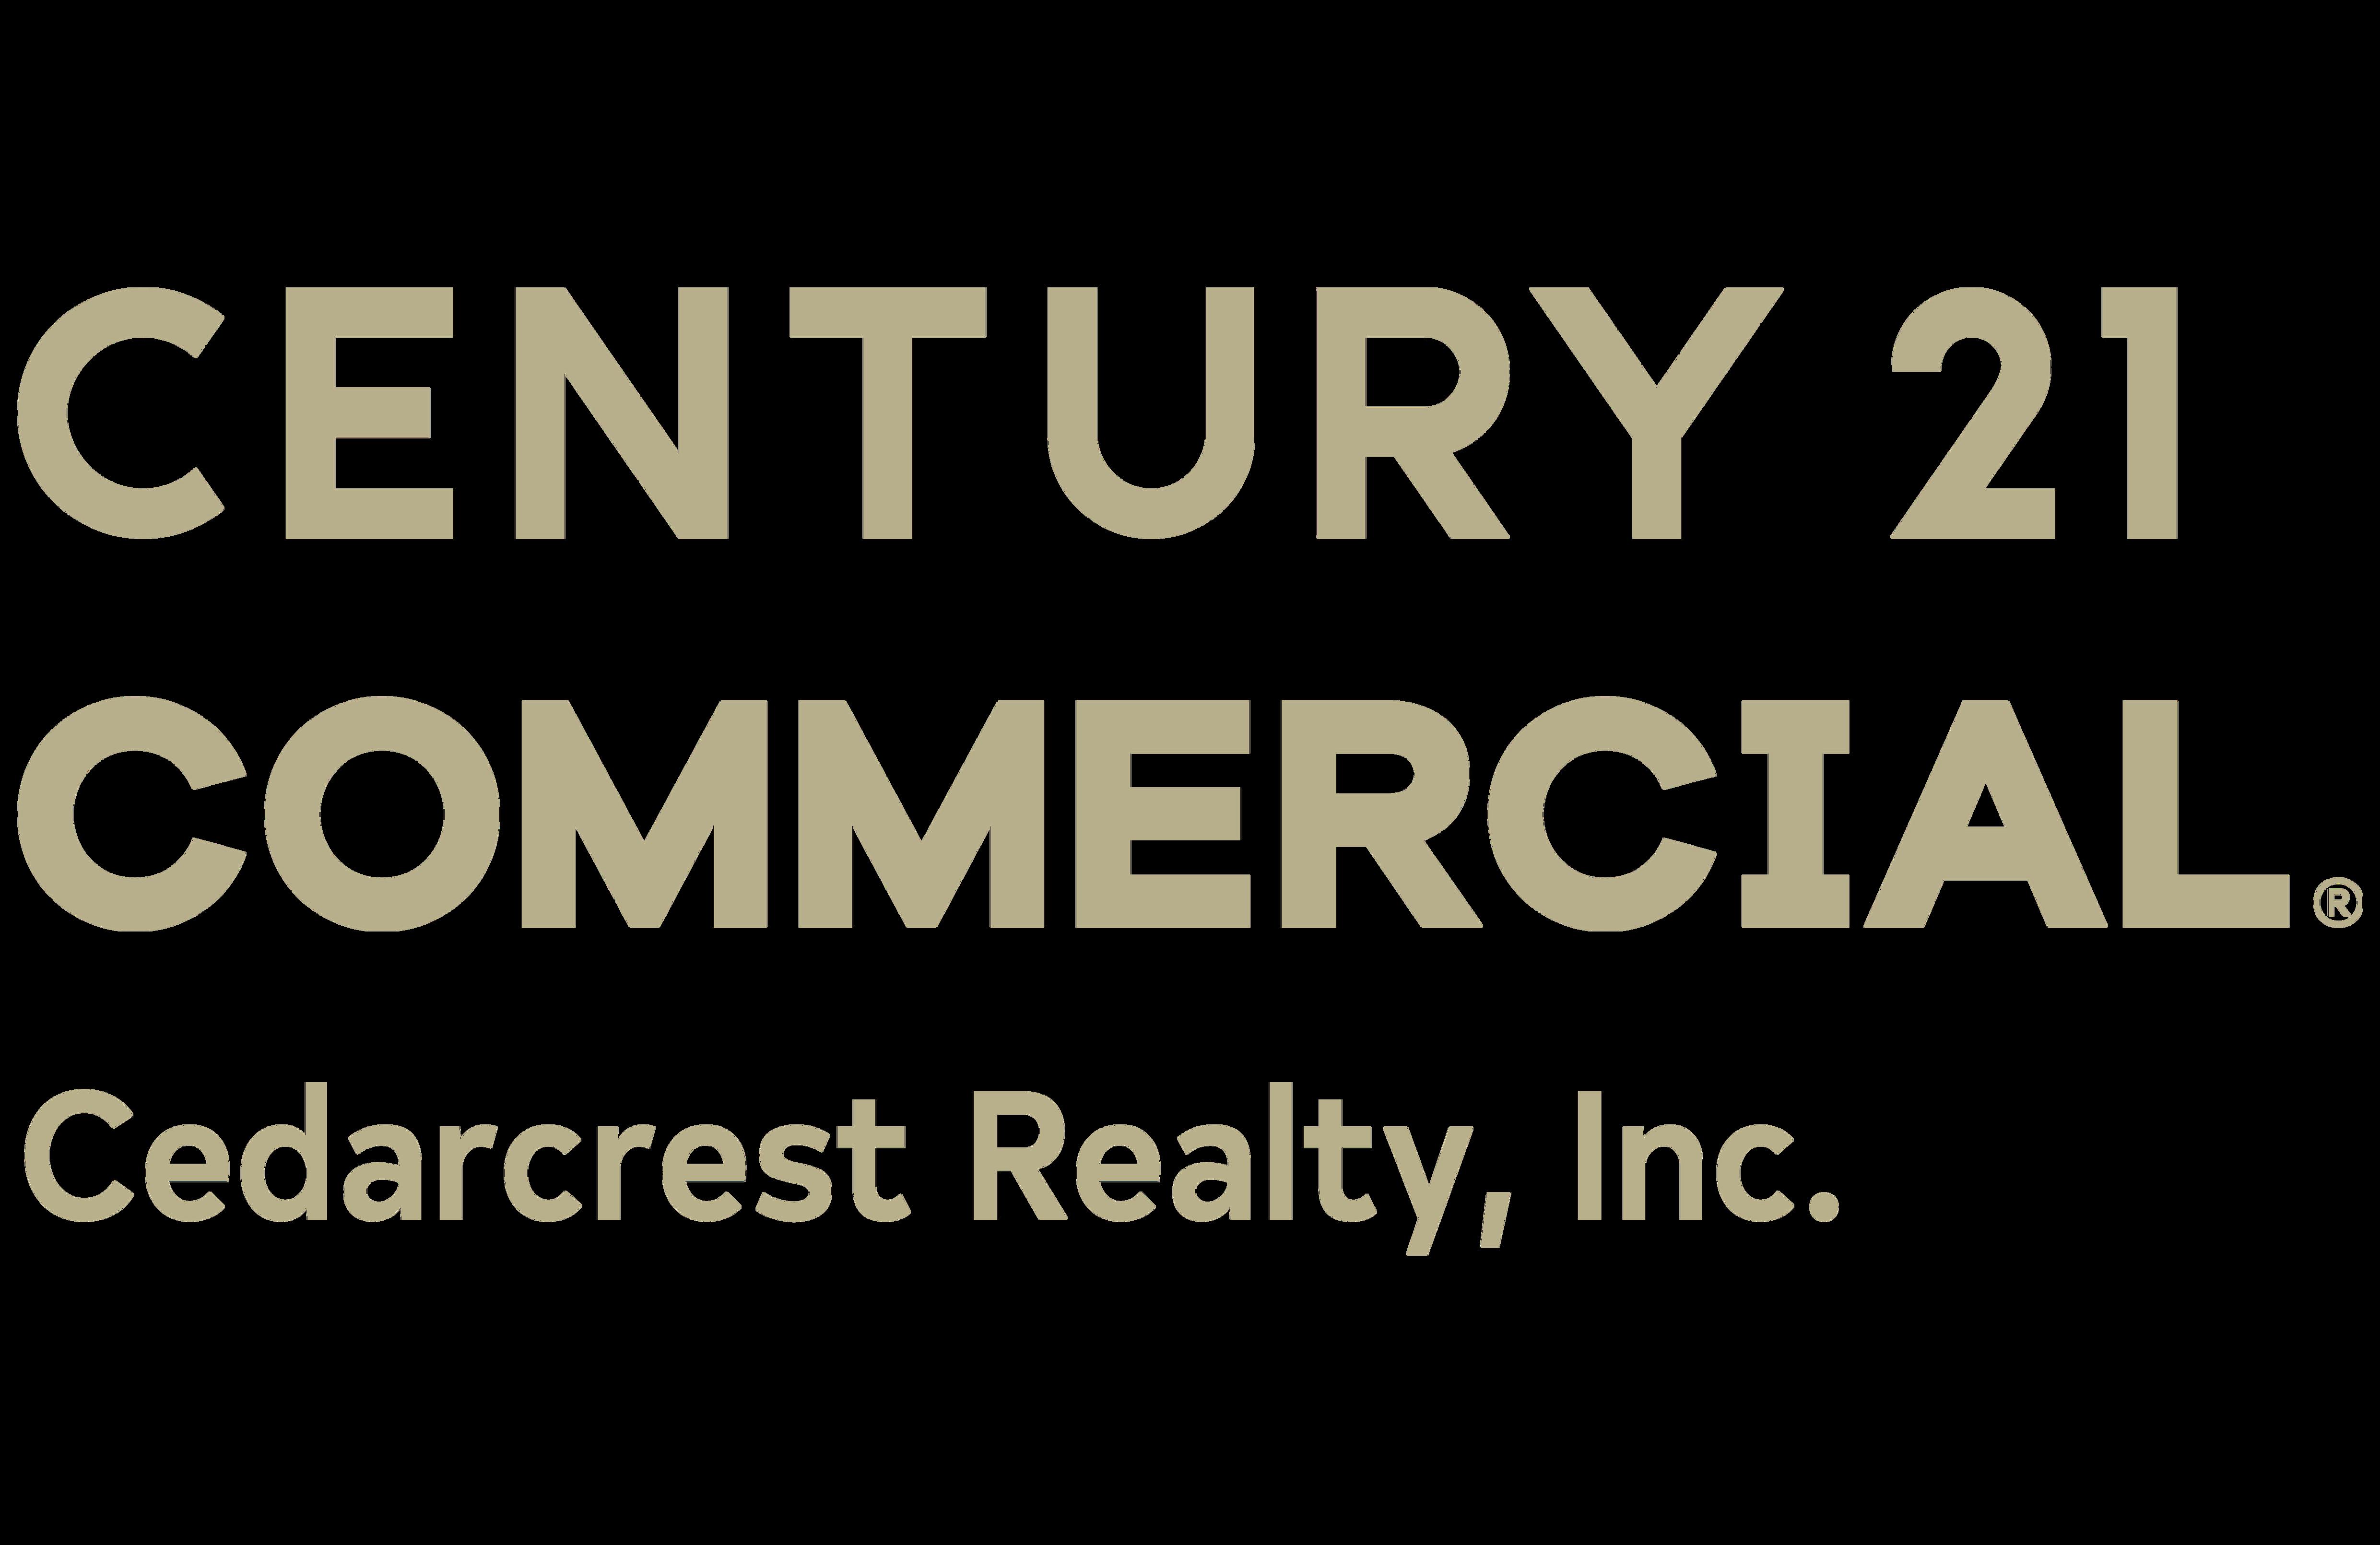 CENTURY 21 Cedarcrest Realty, Inc.